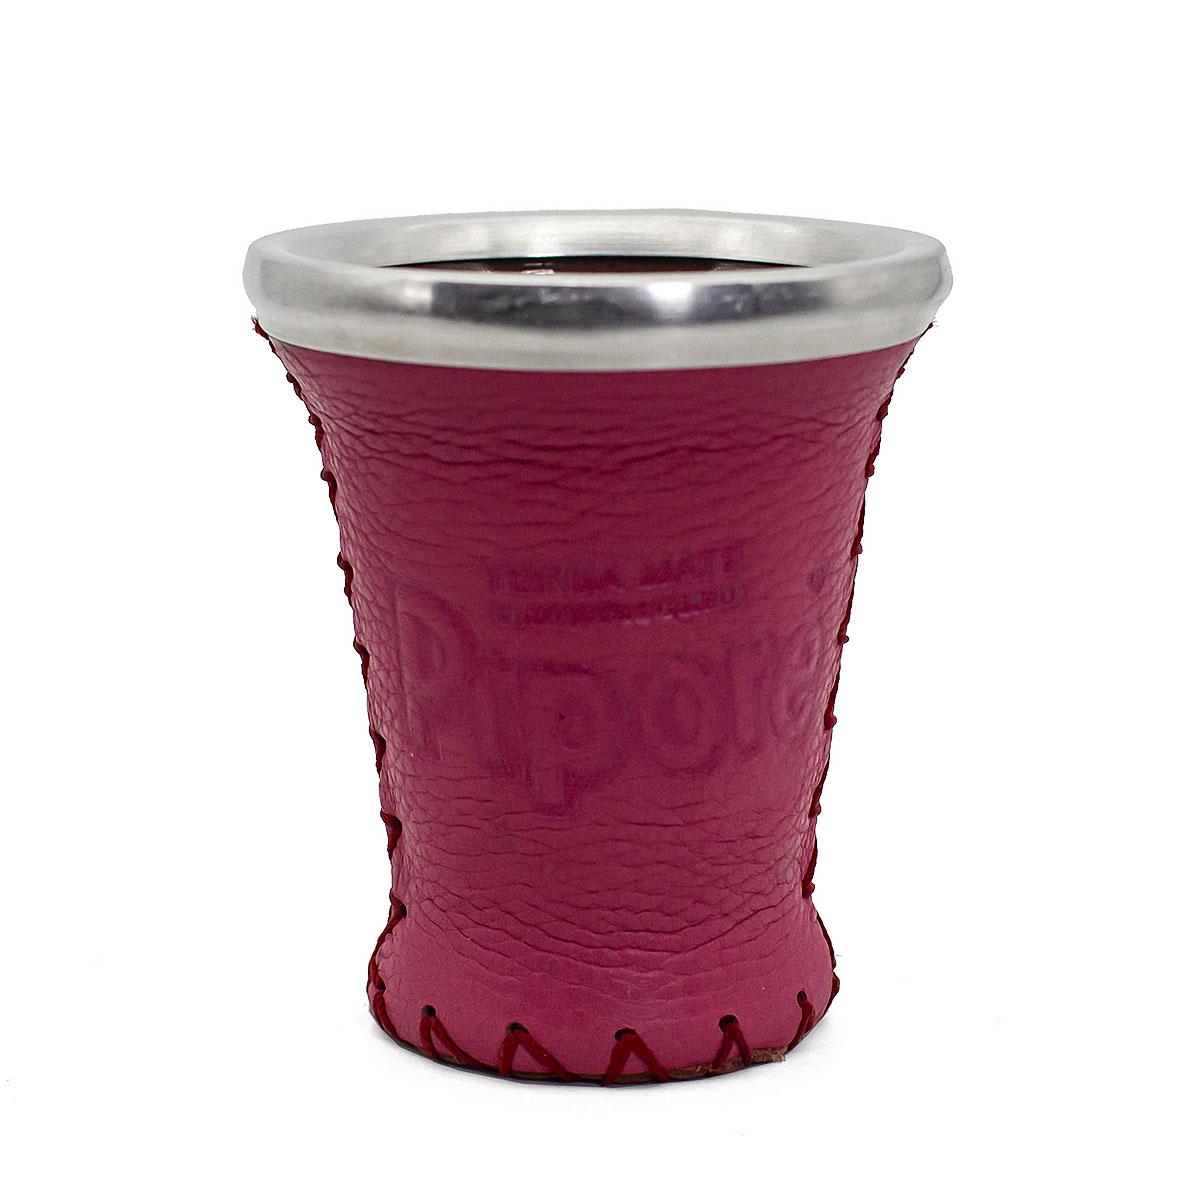 Калабас Pipore розовый, 150 мл калабас гранд чако